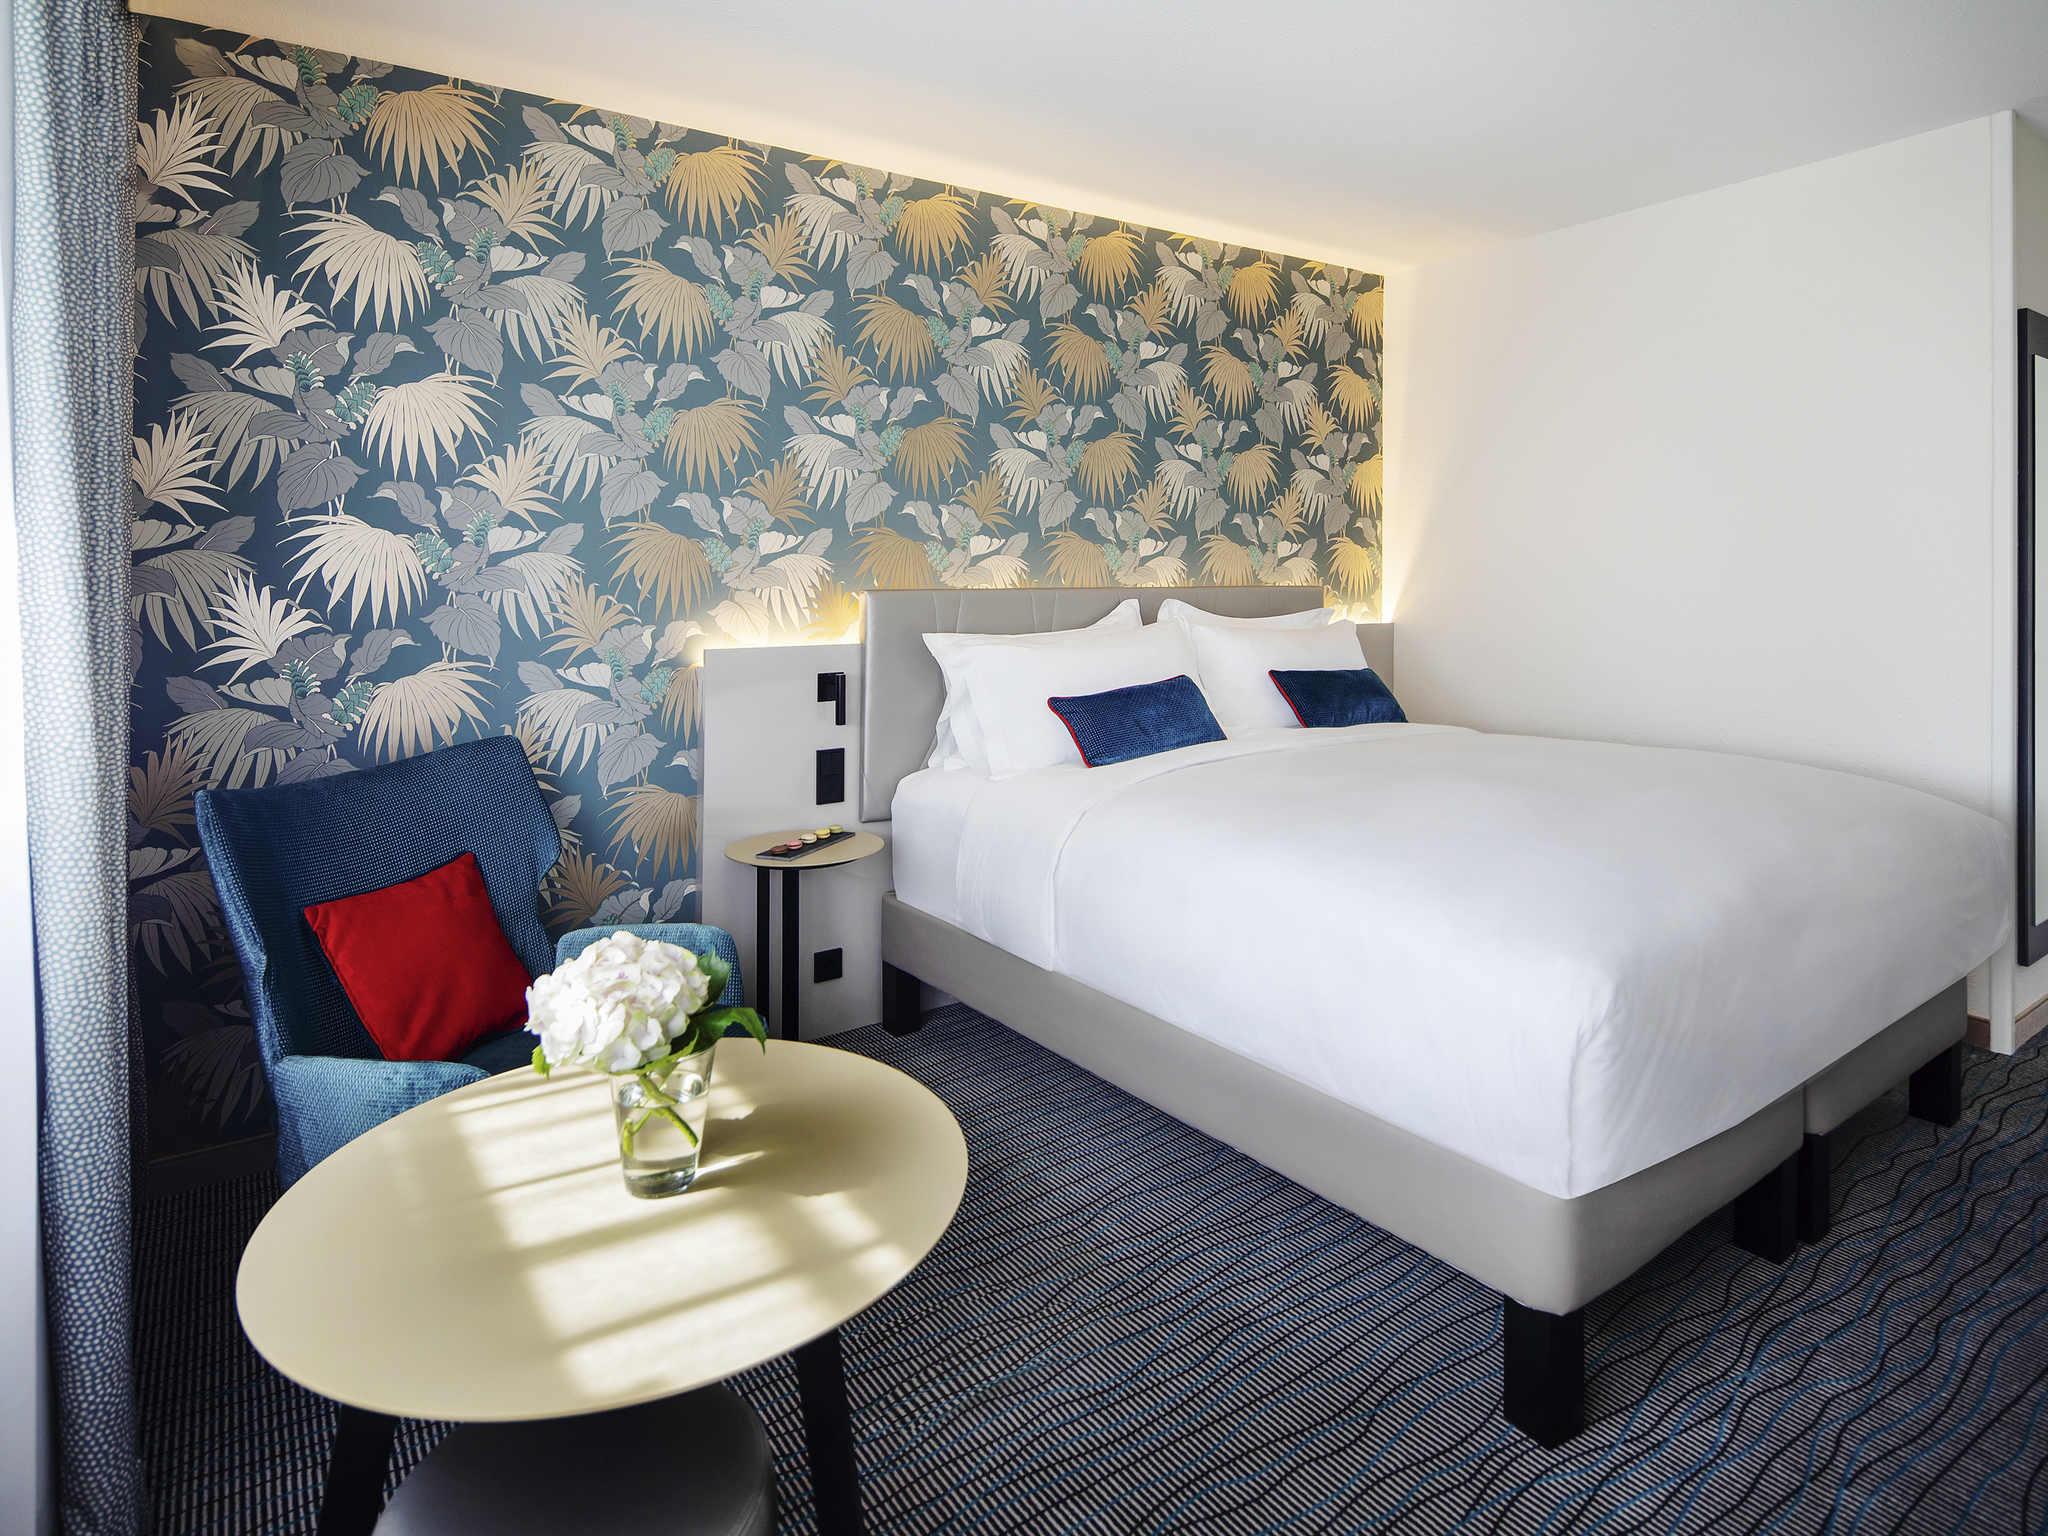 Mercure Bregenz City Hotel